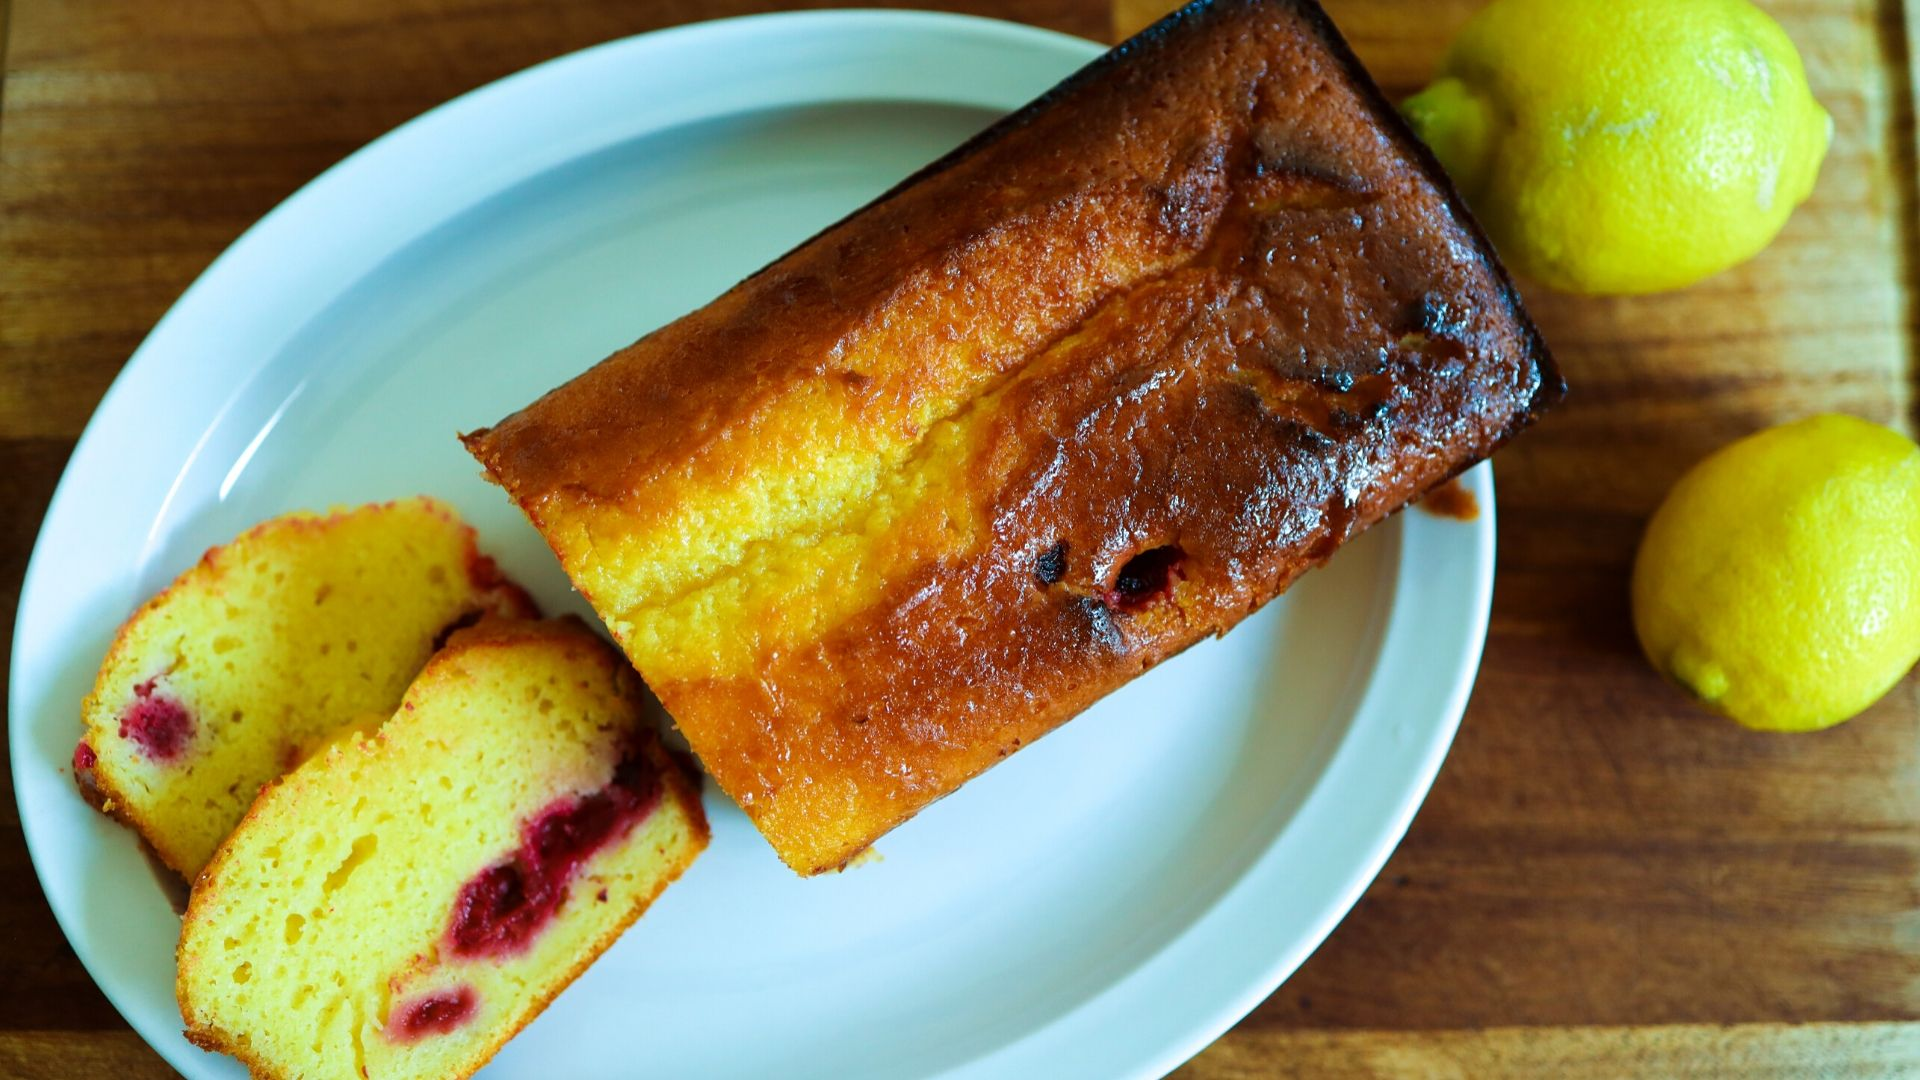 The world's best lemon drizzle cake recipe